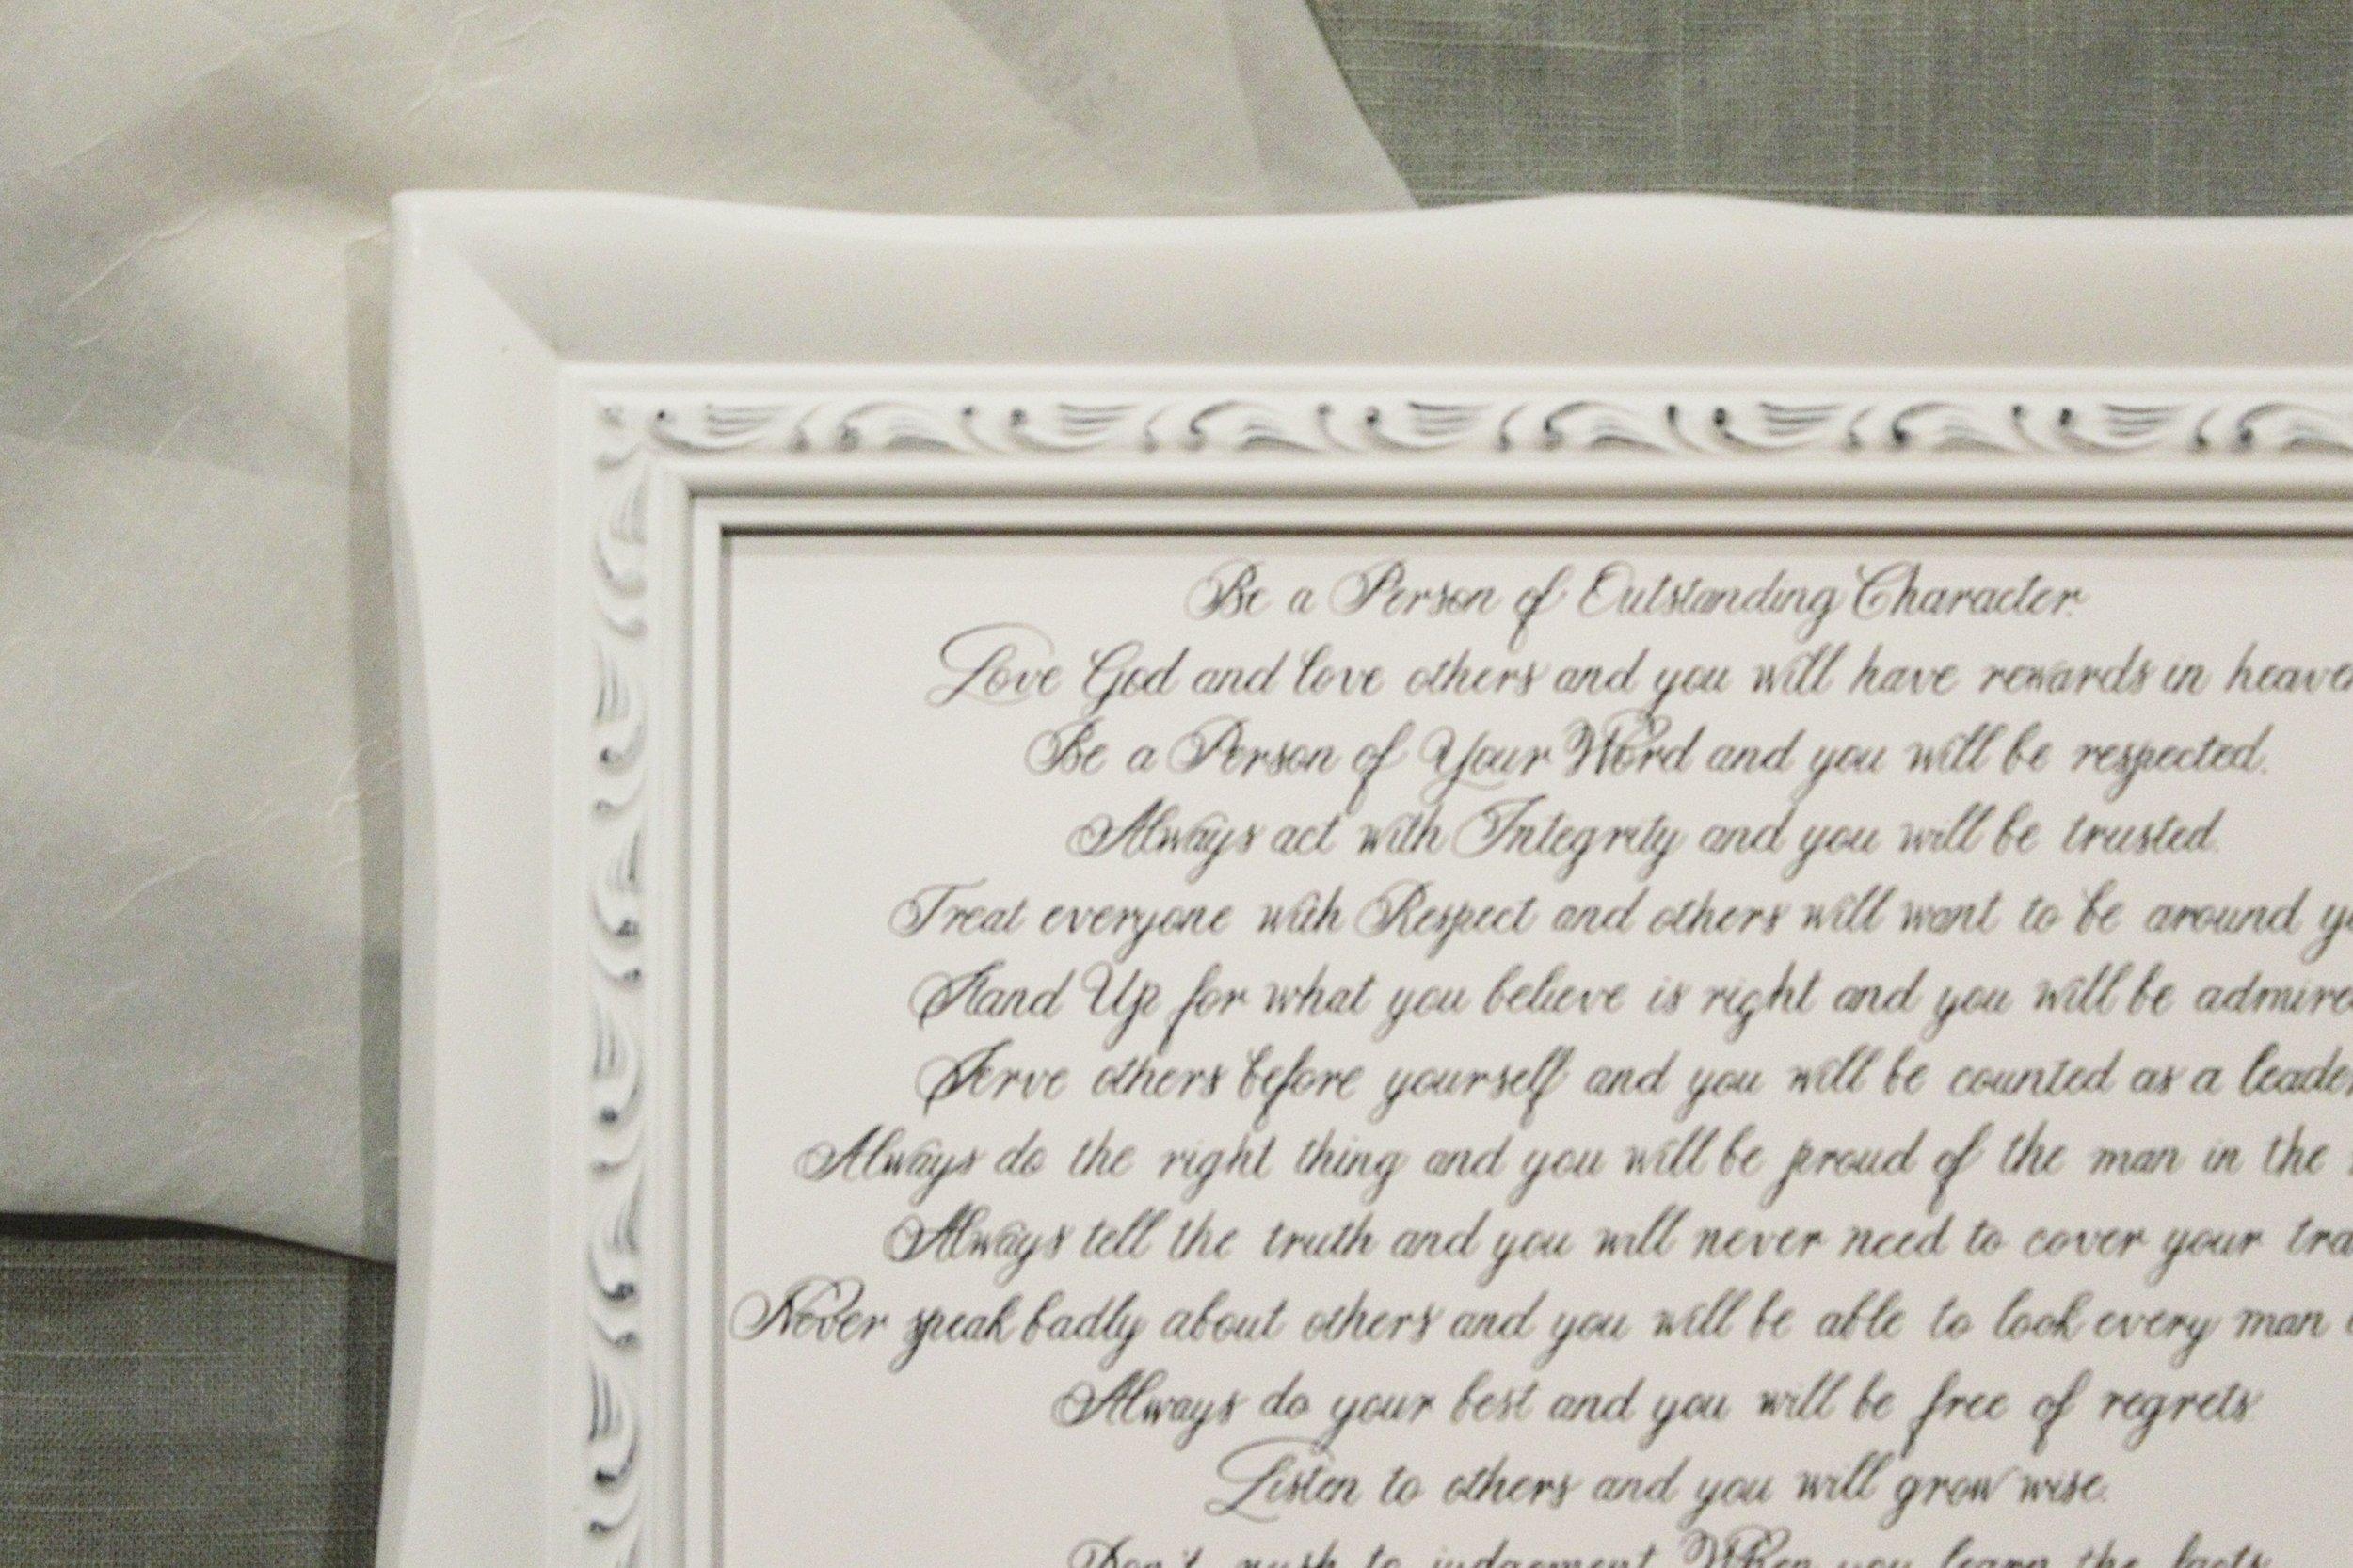 Central PA, York PA, JesSmith Designs, custom, wedding, invitations, bridal, announcements, save the date, baby, hanover, calligraphy, baltimore, wedding invitations, lancaster, gettysburg-05-16 22.18.12.jpg